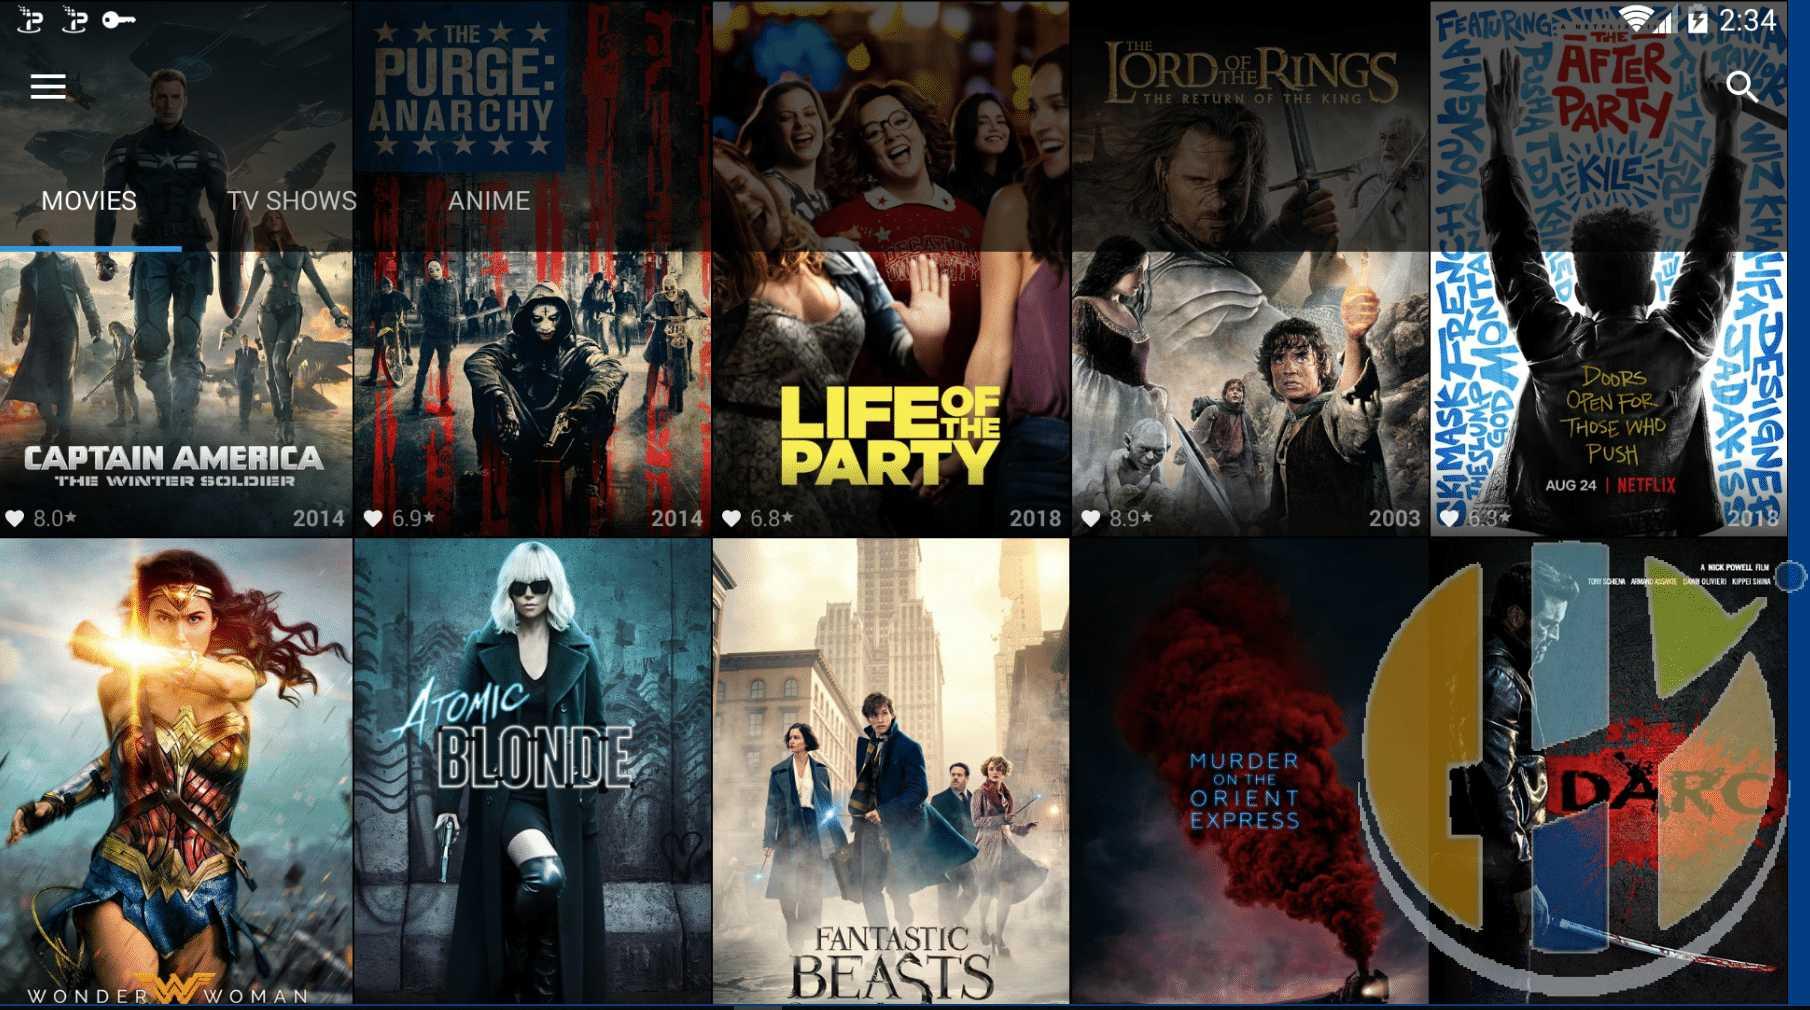 Torrent netflix apk | Download Netflix For PC,Windows 7,8,10